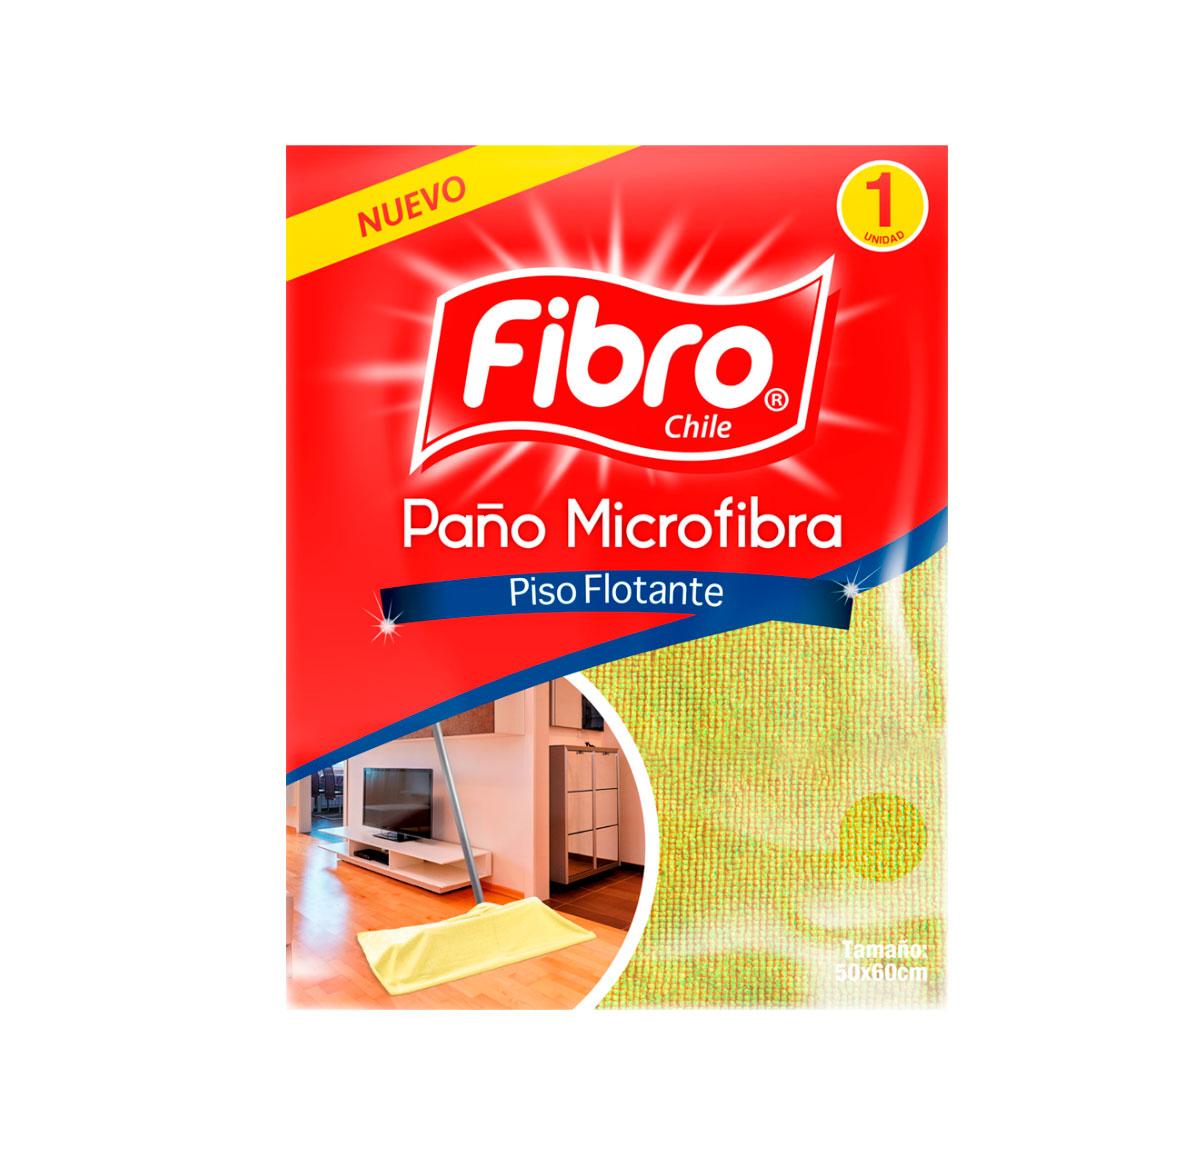 Paño de microfibra piso flotante